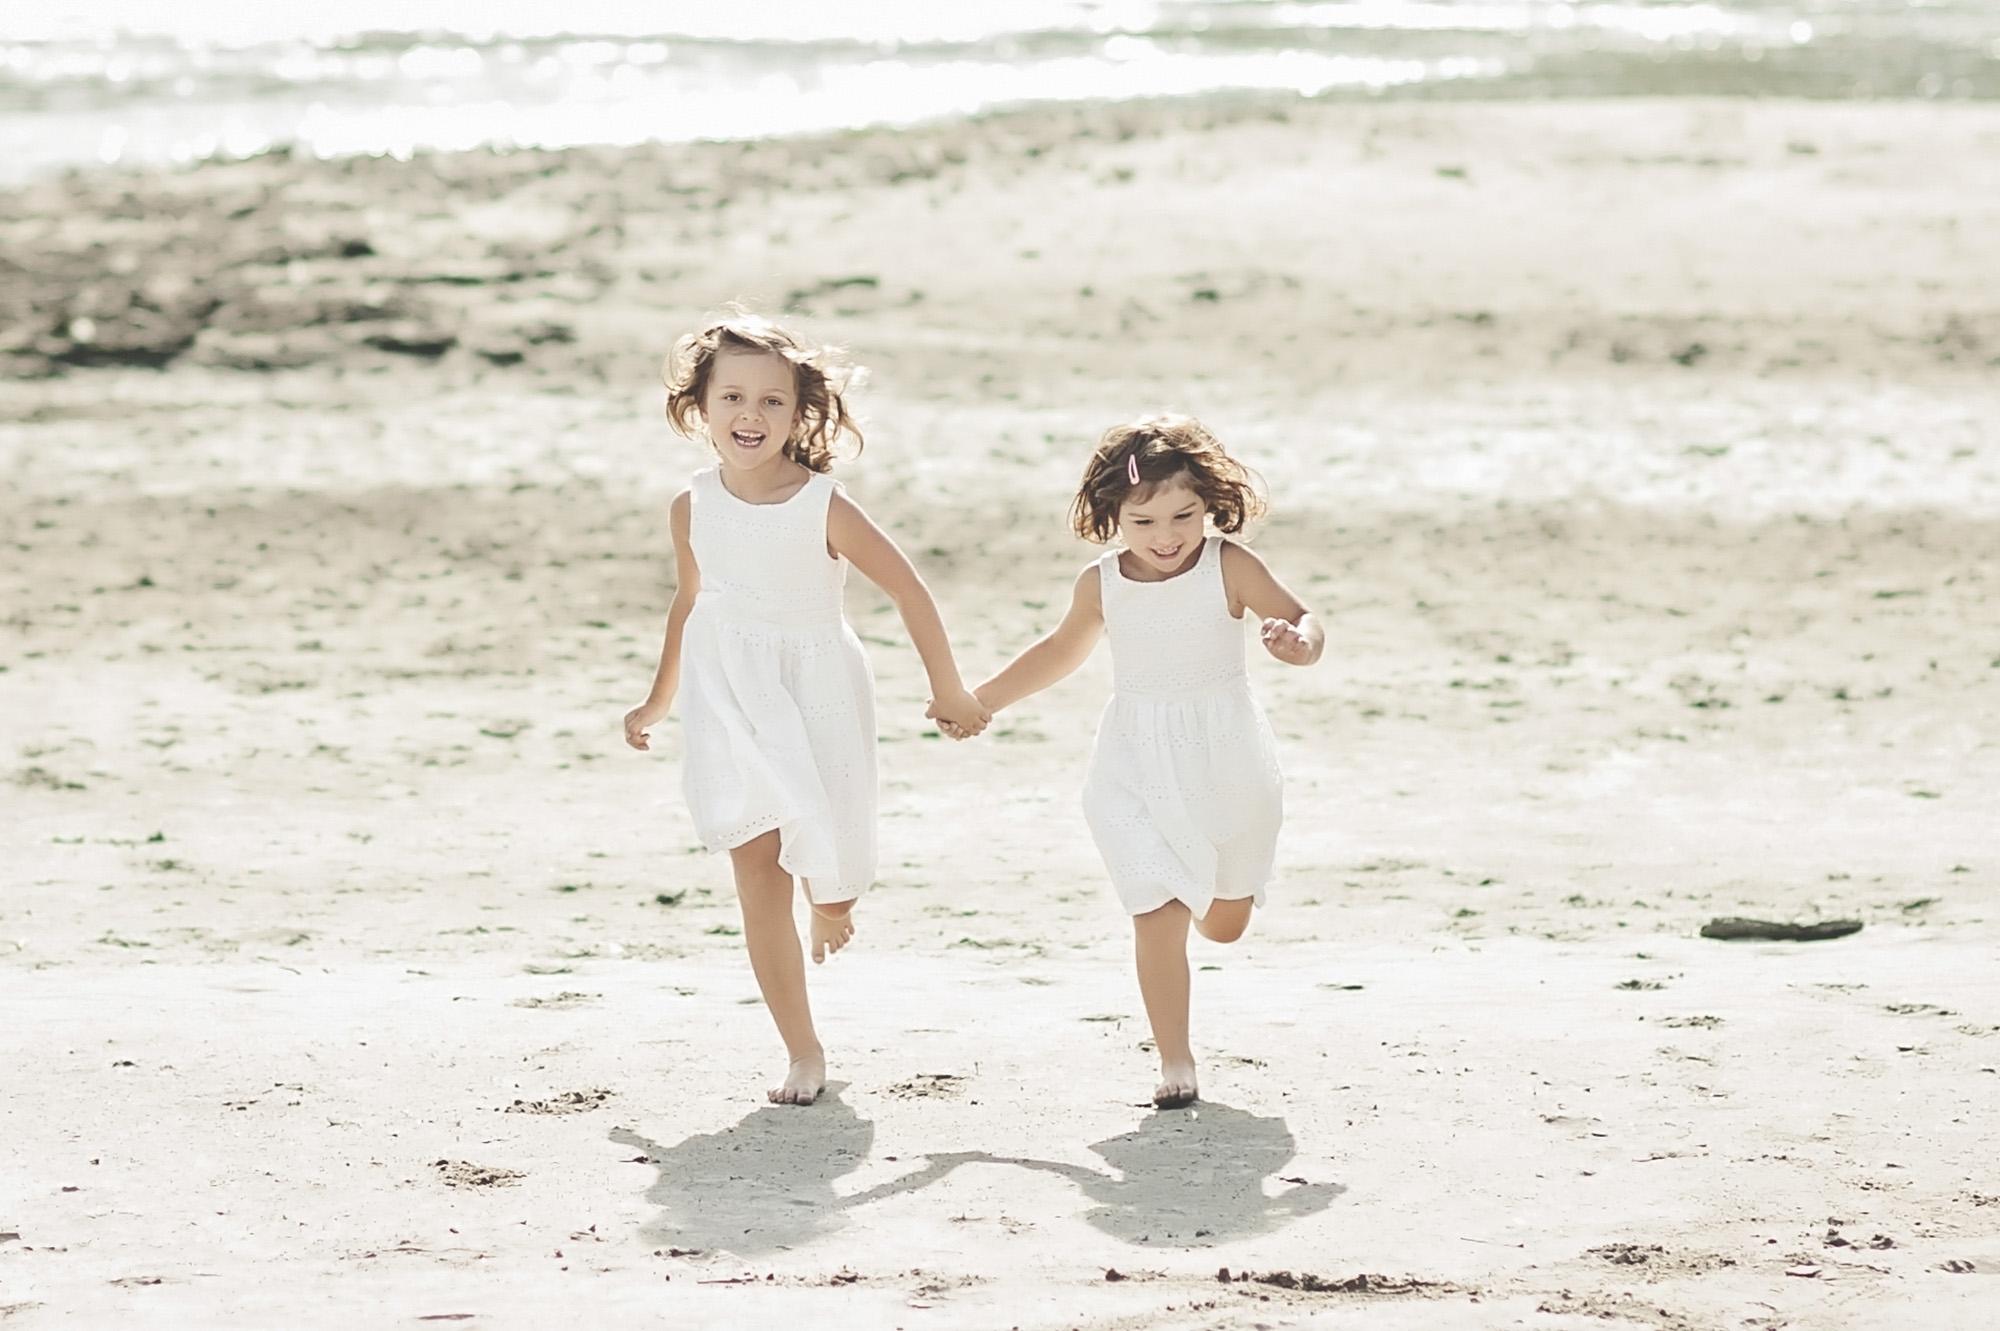 Kinderfotograf_Ebersberg